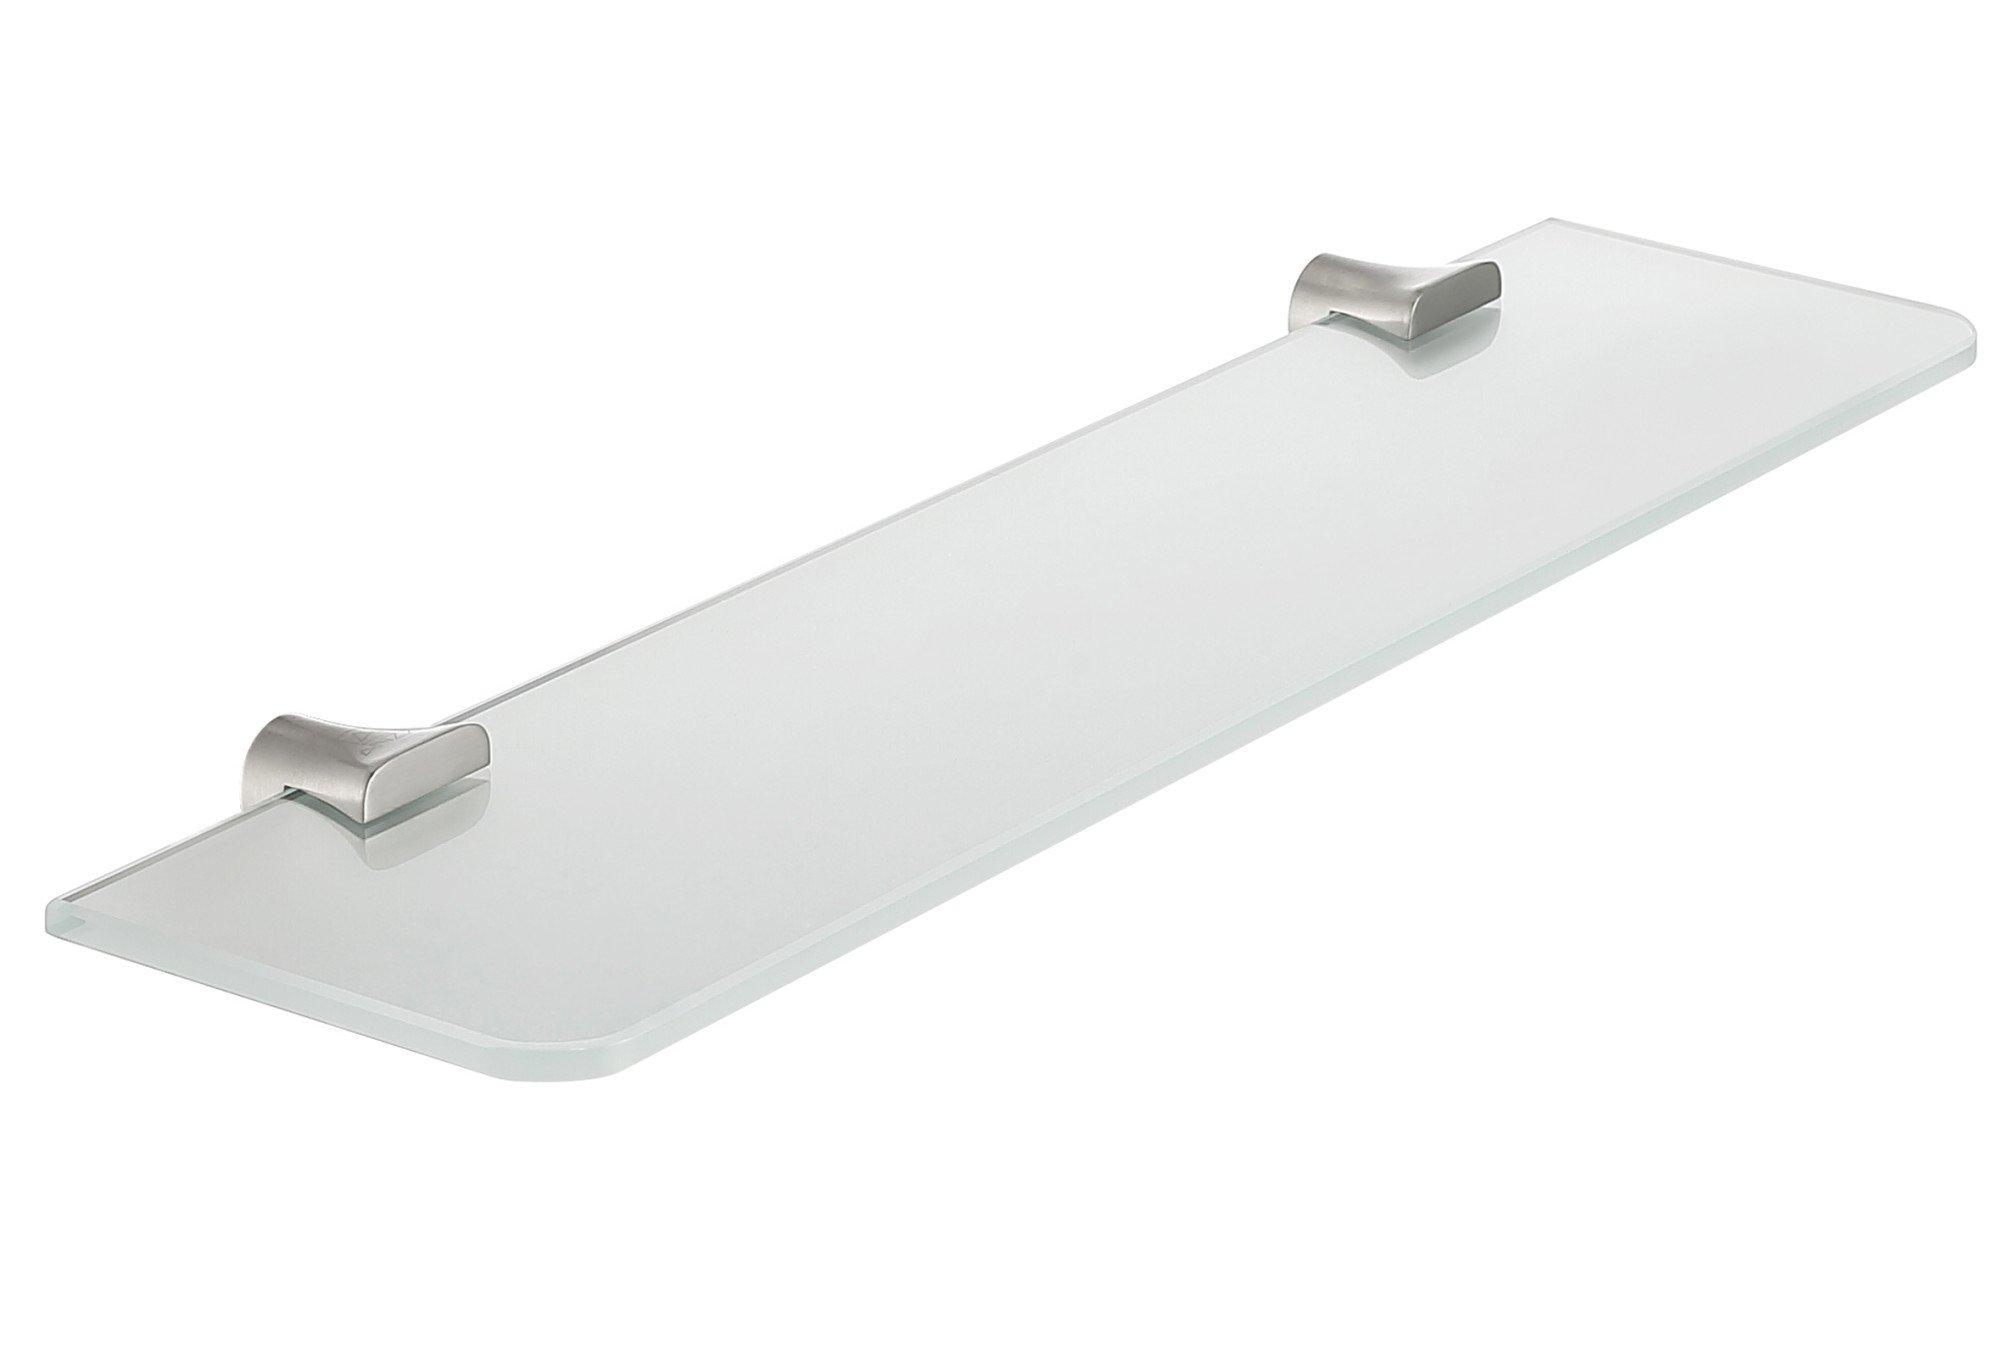 19.69'' Glass Shelf - Brushed Nickel - Essence Series AC-AZ050BN - ANZZI